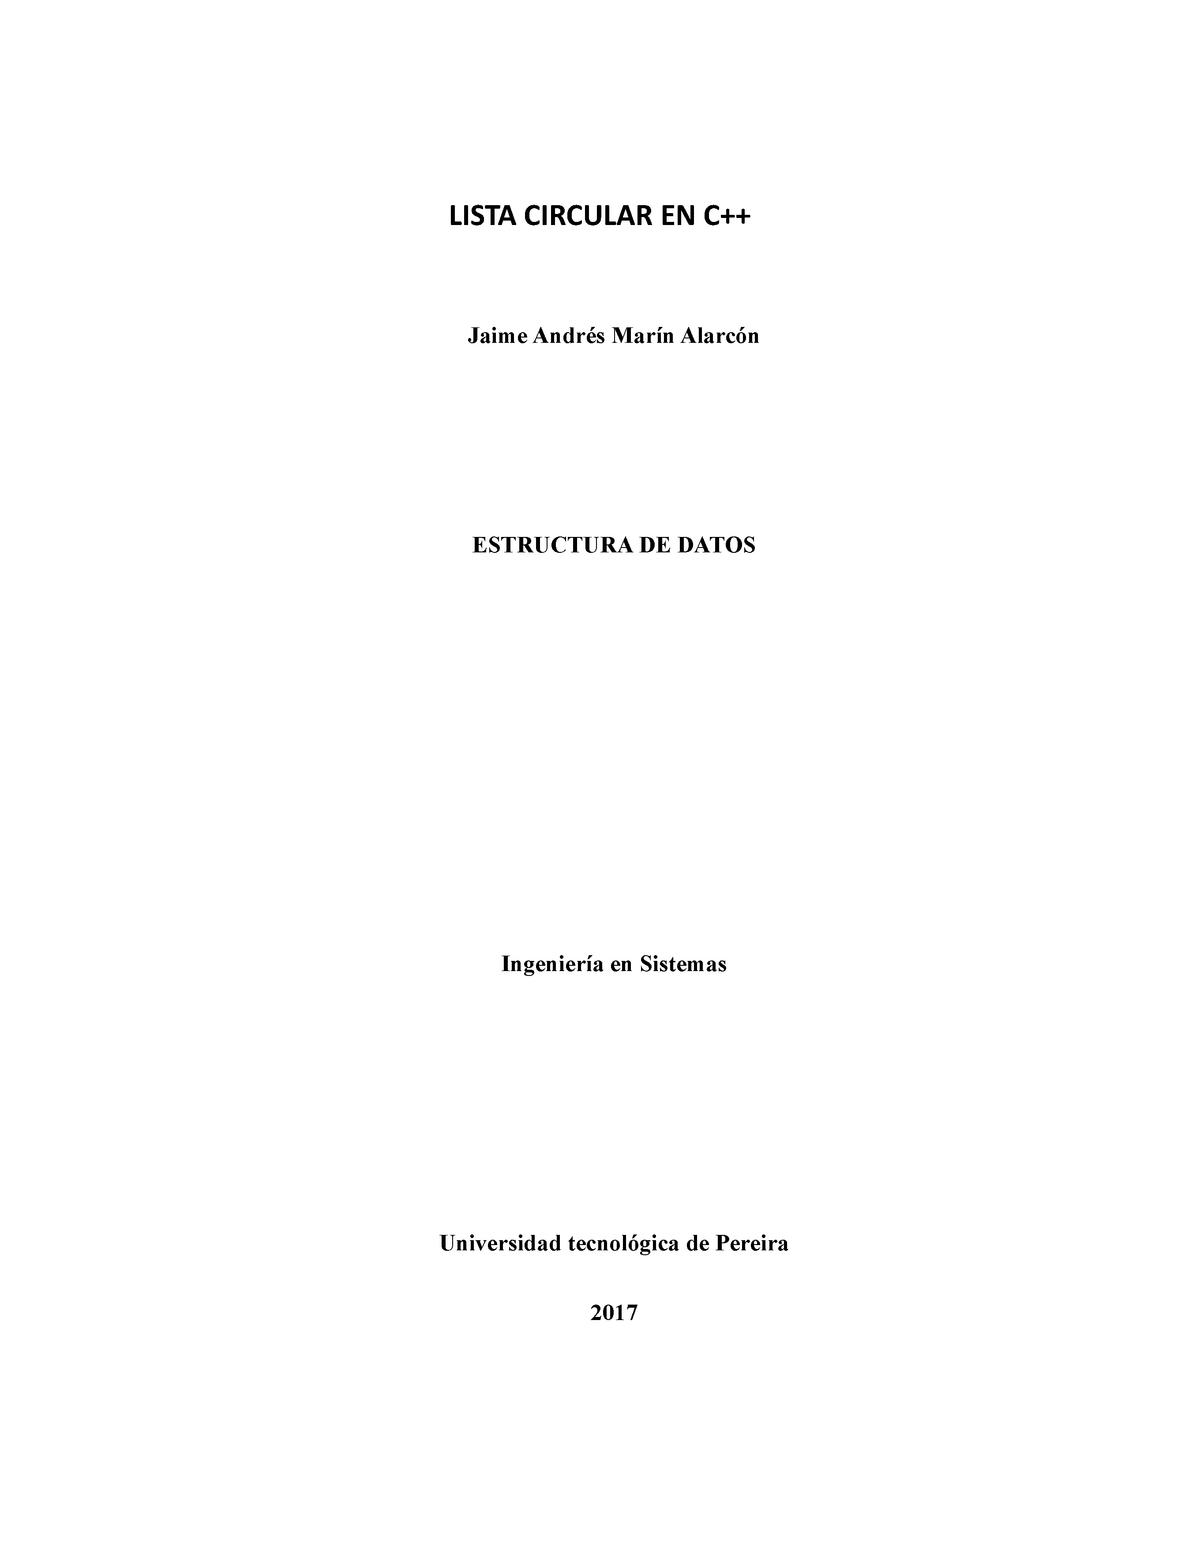 Lista Circular En C Estructura De Datos Is304 Utp Studocu